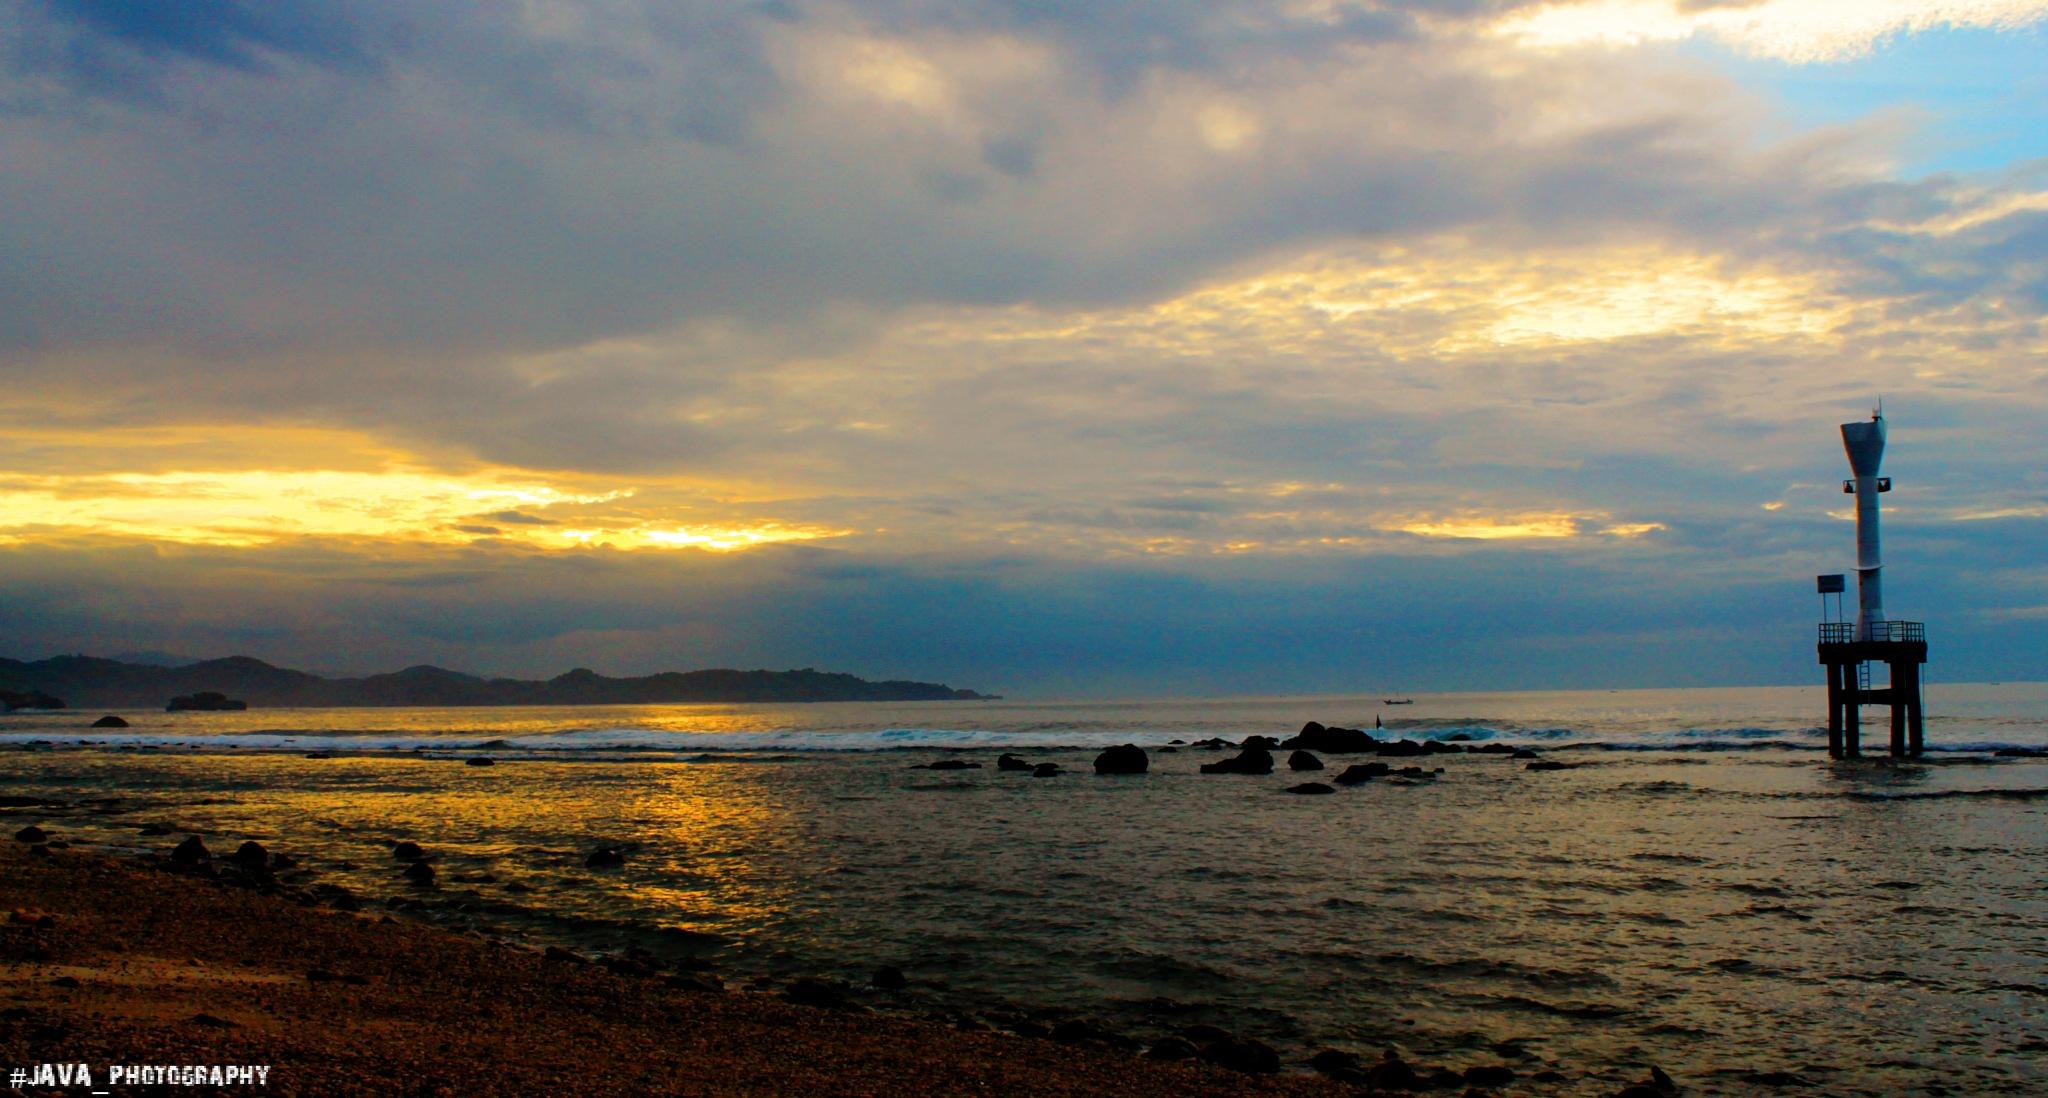 pacitan beach by pief gustida